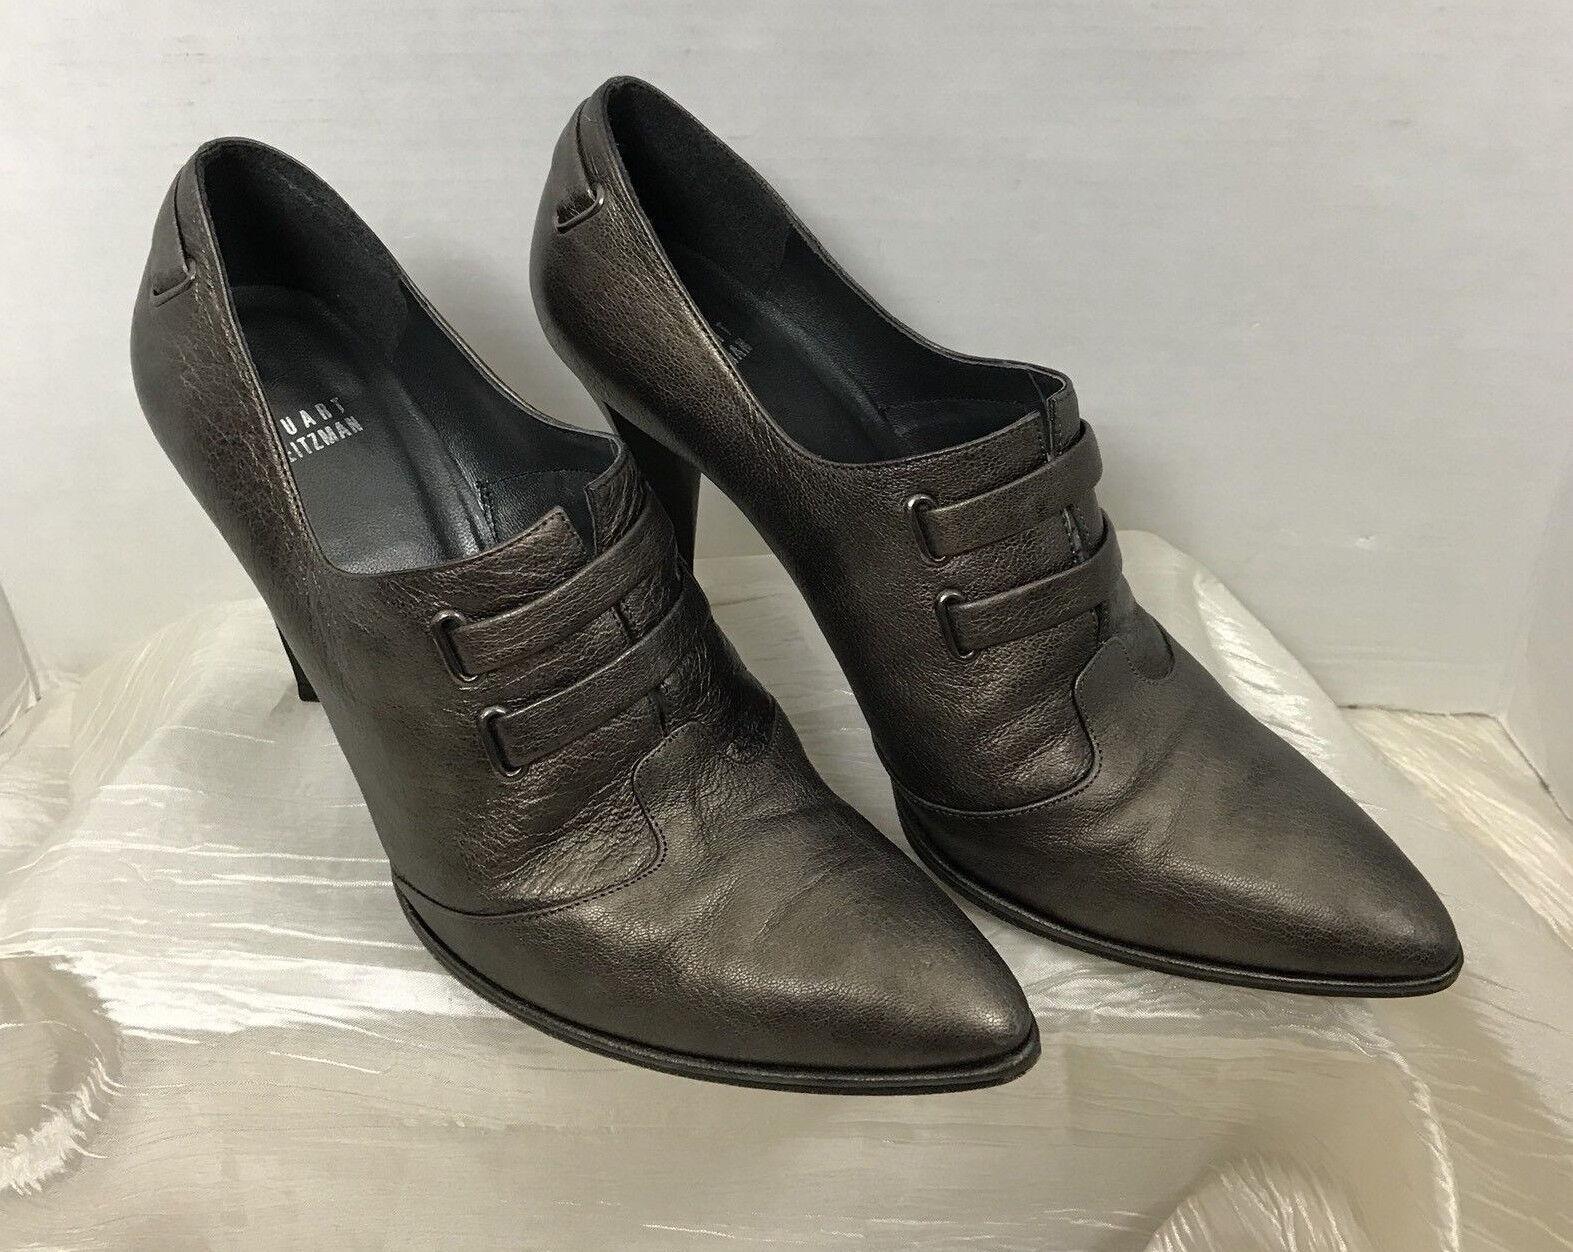 Stuart Weitzman Chaussures Talons strapado Jasper PERLE LAMA Métallique Femme Taille 10